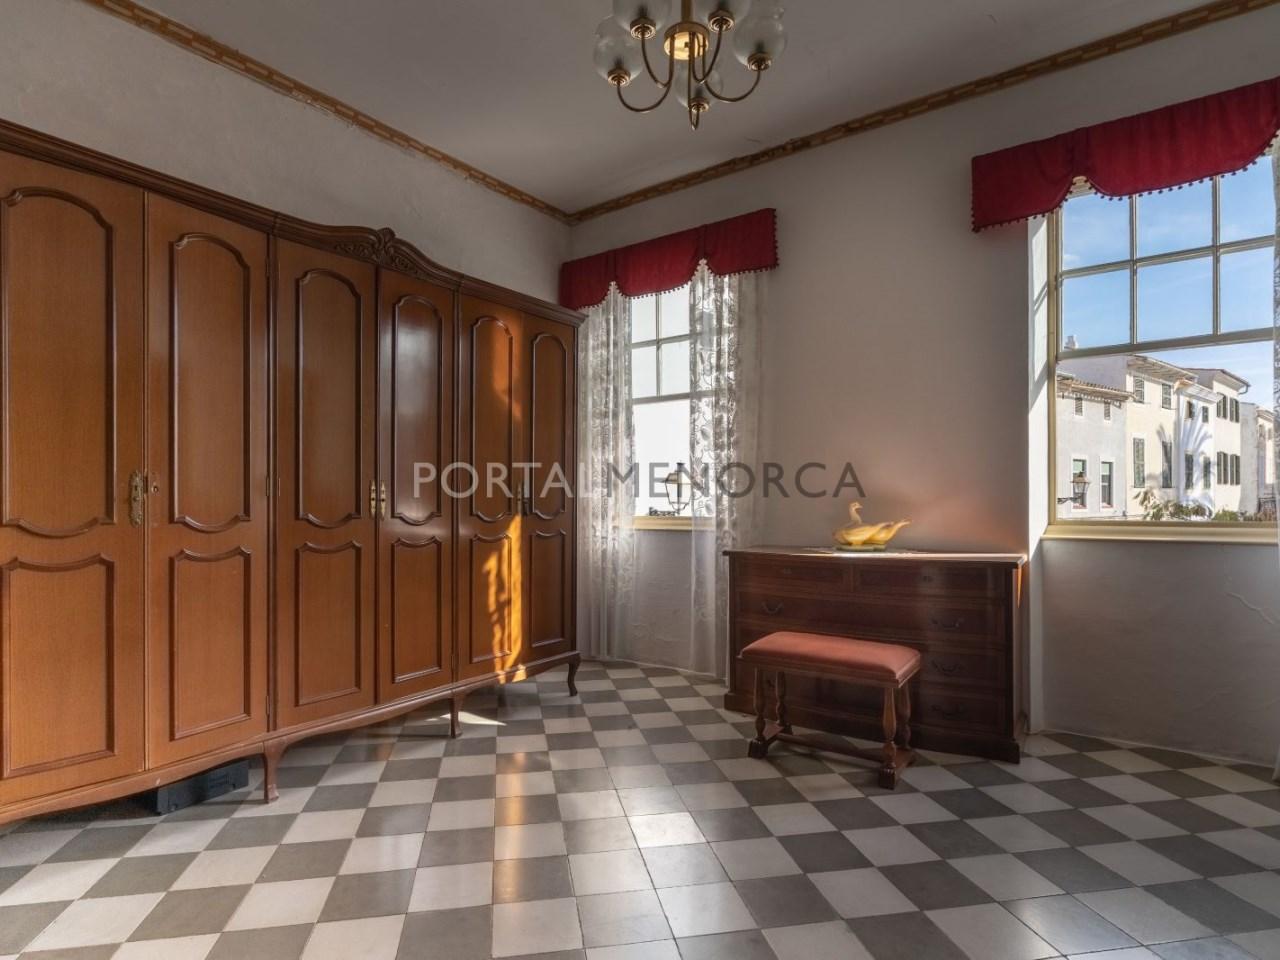 vendre-maison-alaior-menorca (2)